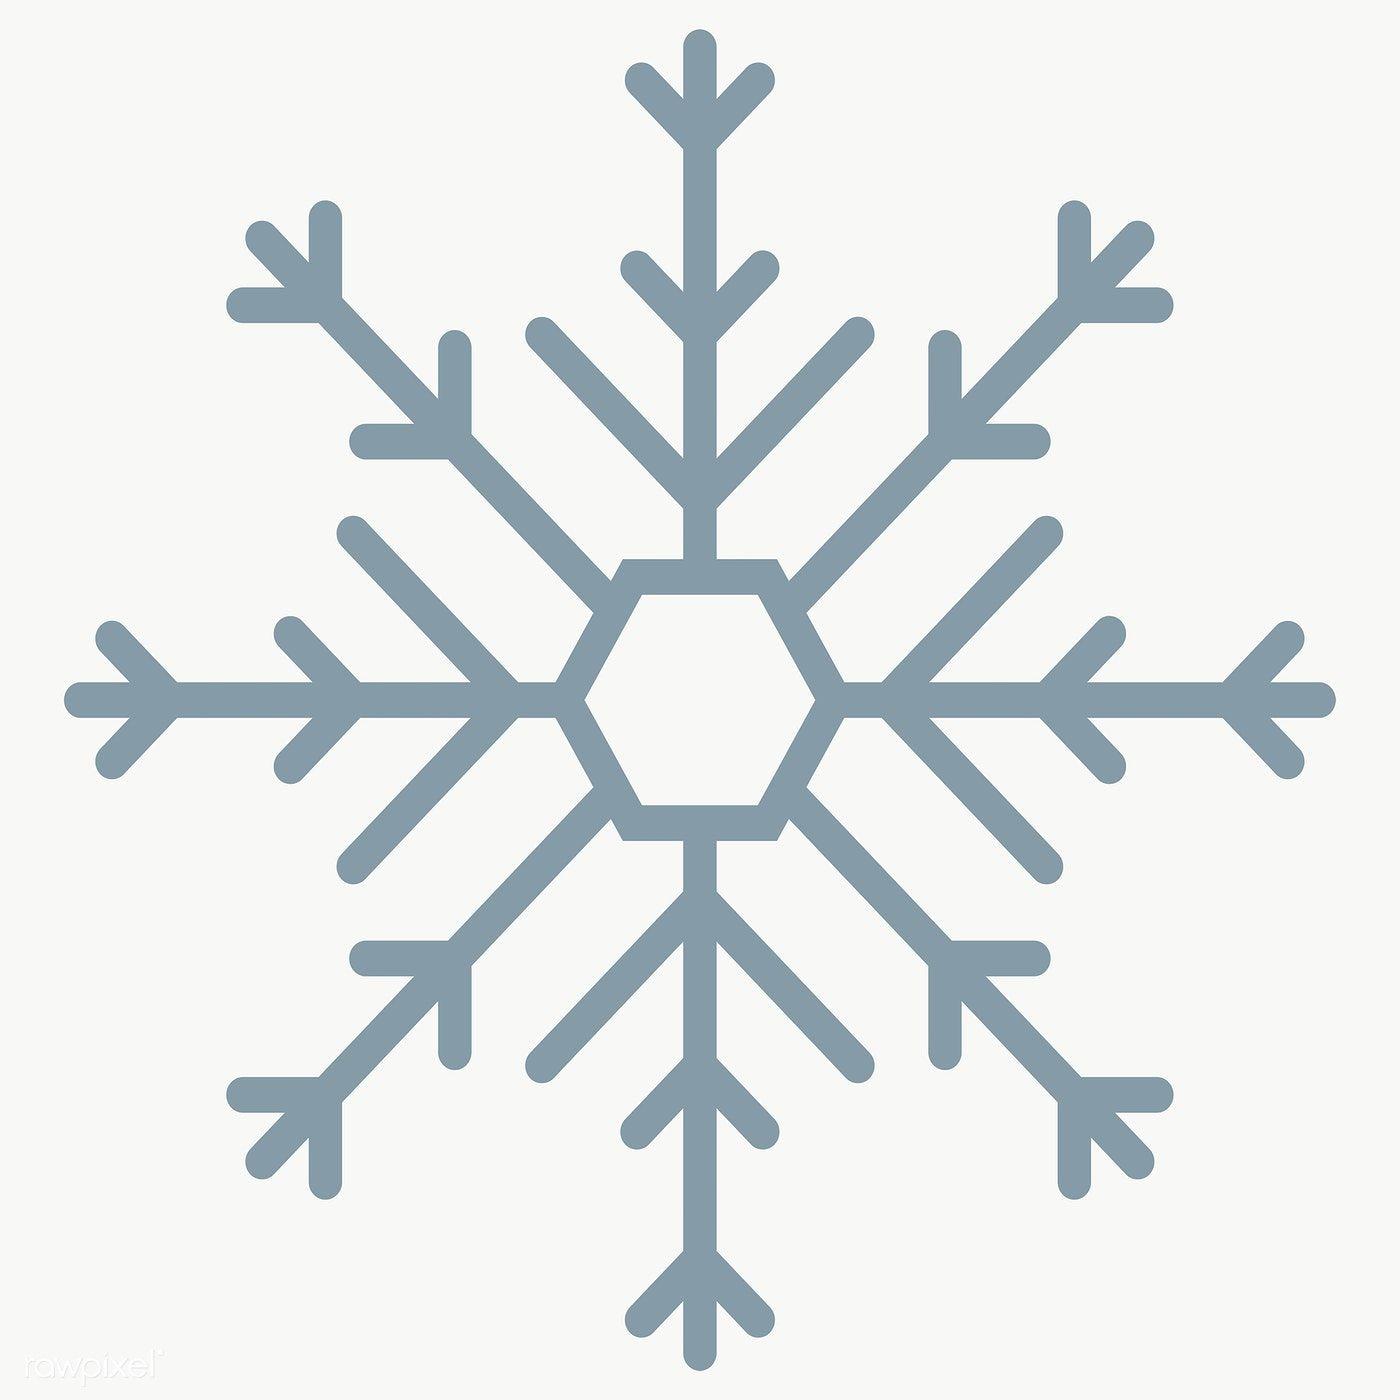 Snowflake Christmas Social Ads Template Transparent Png Premium Image By Rawpixel Com Sasi Snowflake Images Social Ads Christmas Icons